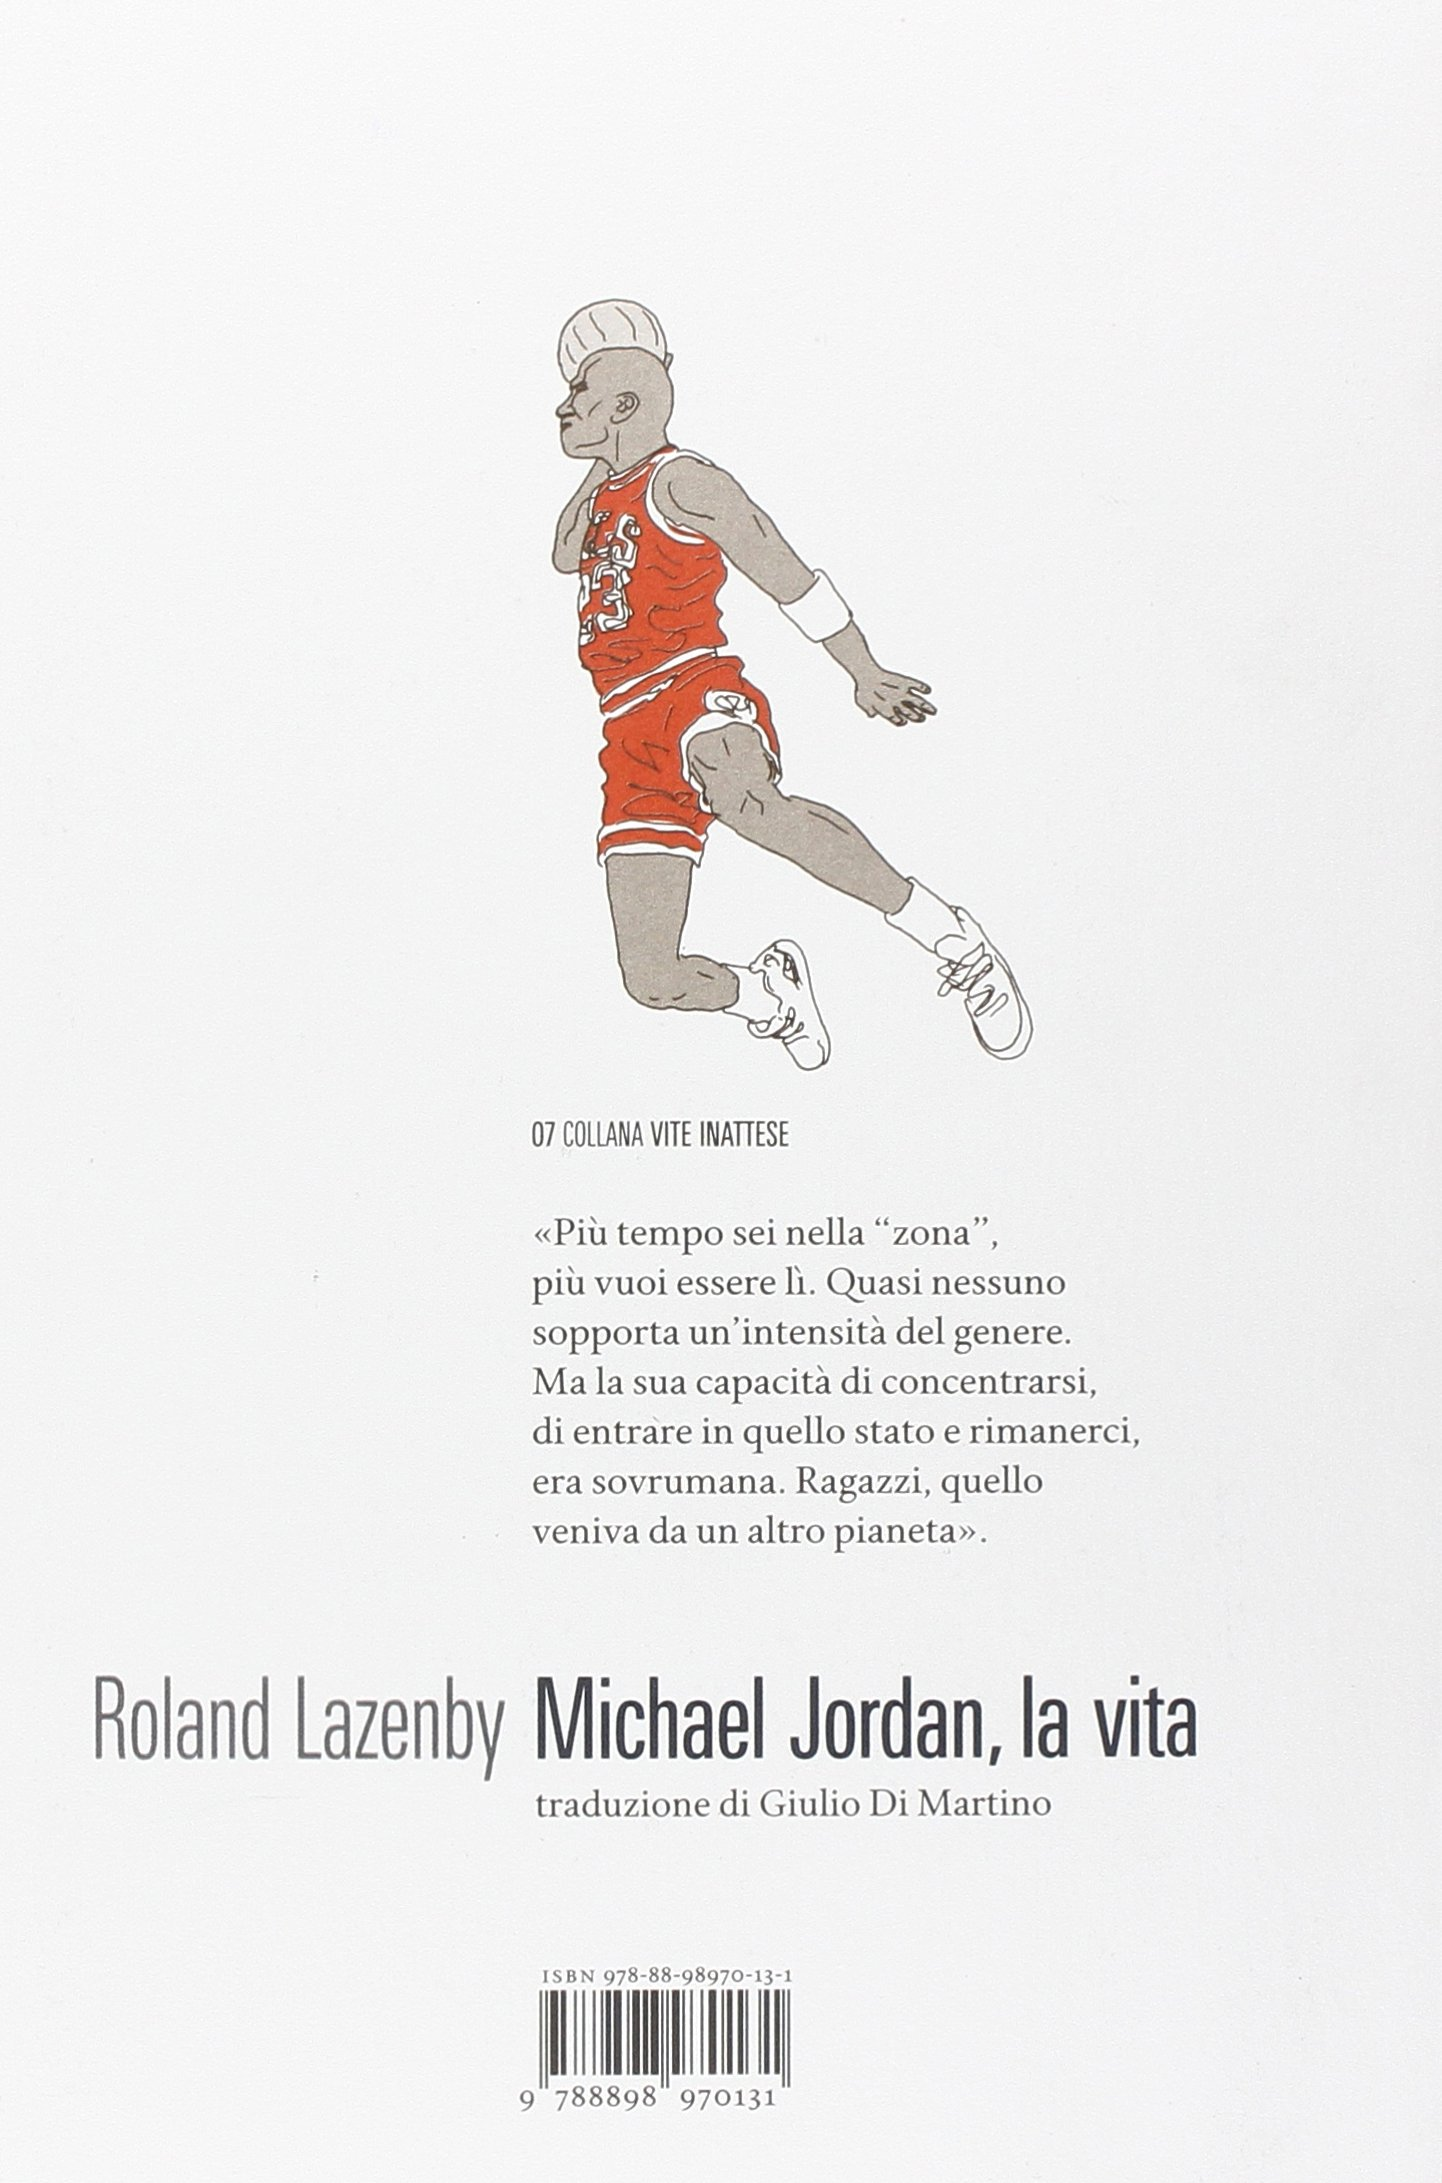 Amazon.it: Michael Jordan, la vita - Roland Lazenby, G. Di Martino ...